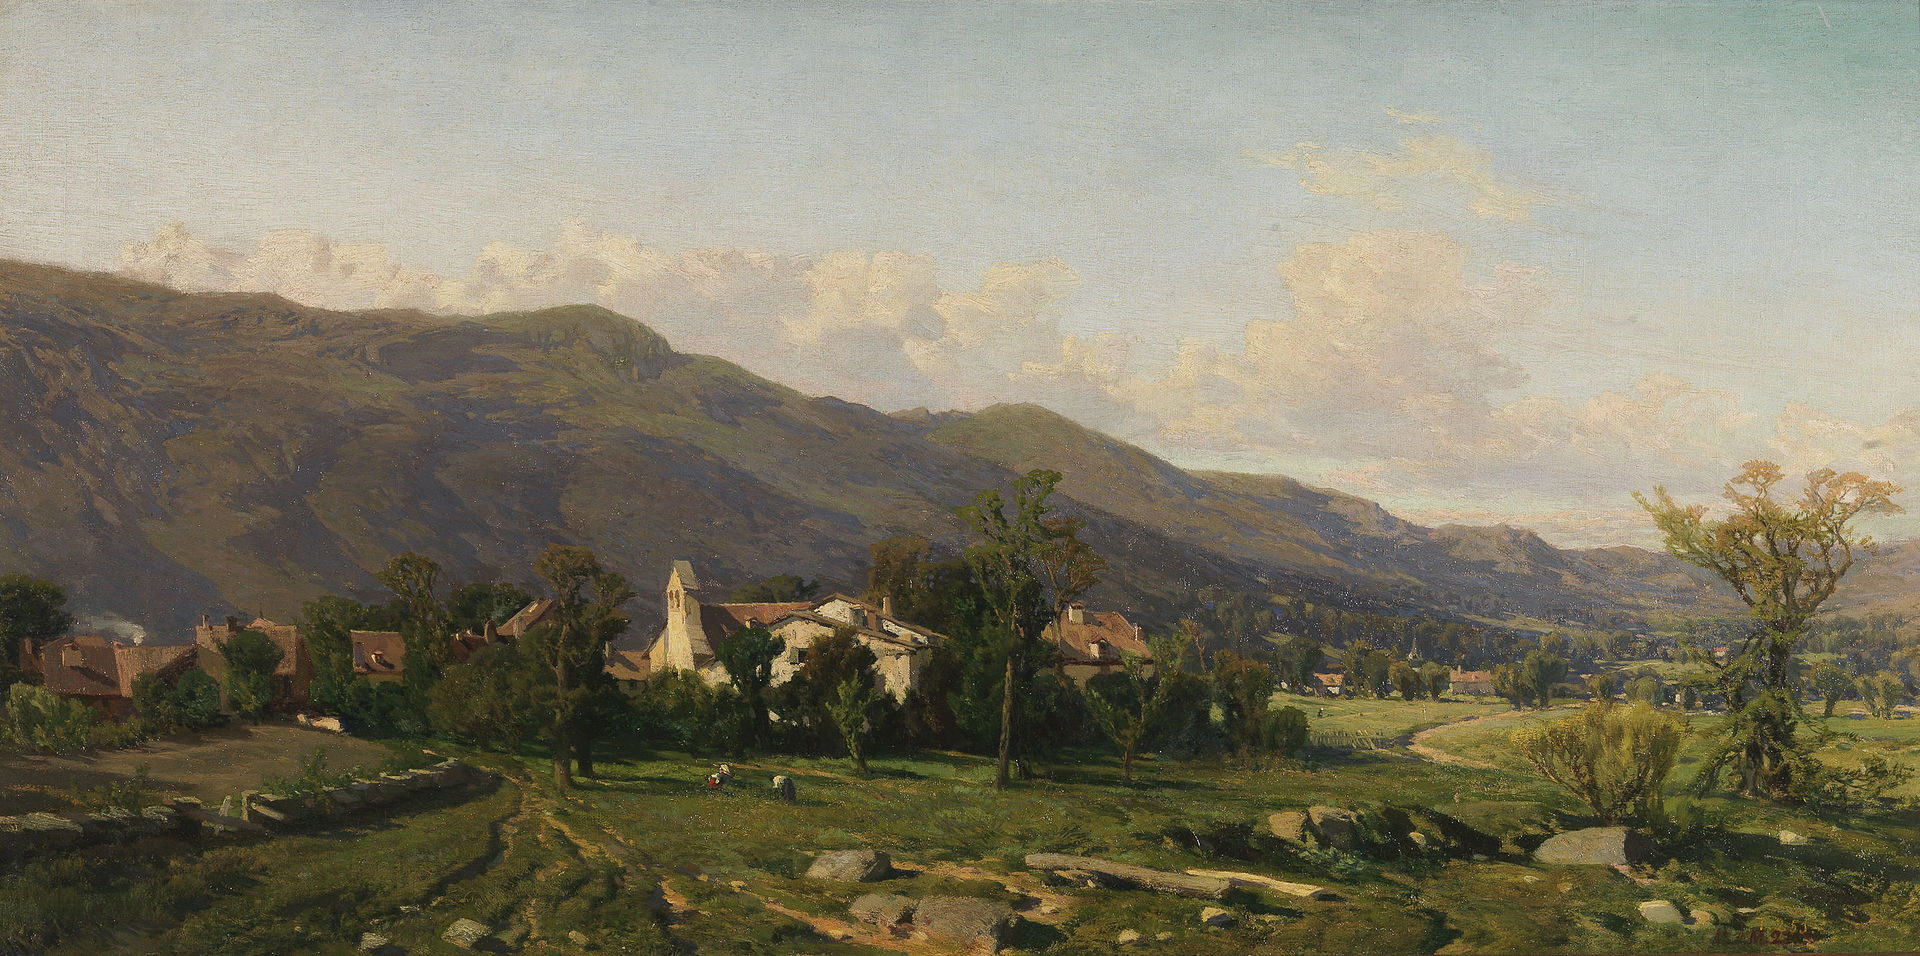 Paisaje de Suiza, por Martín Rico.jpg